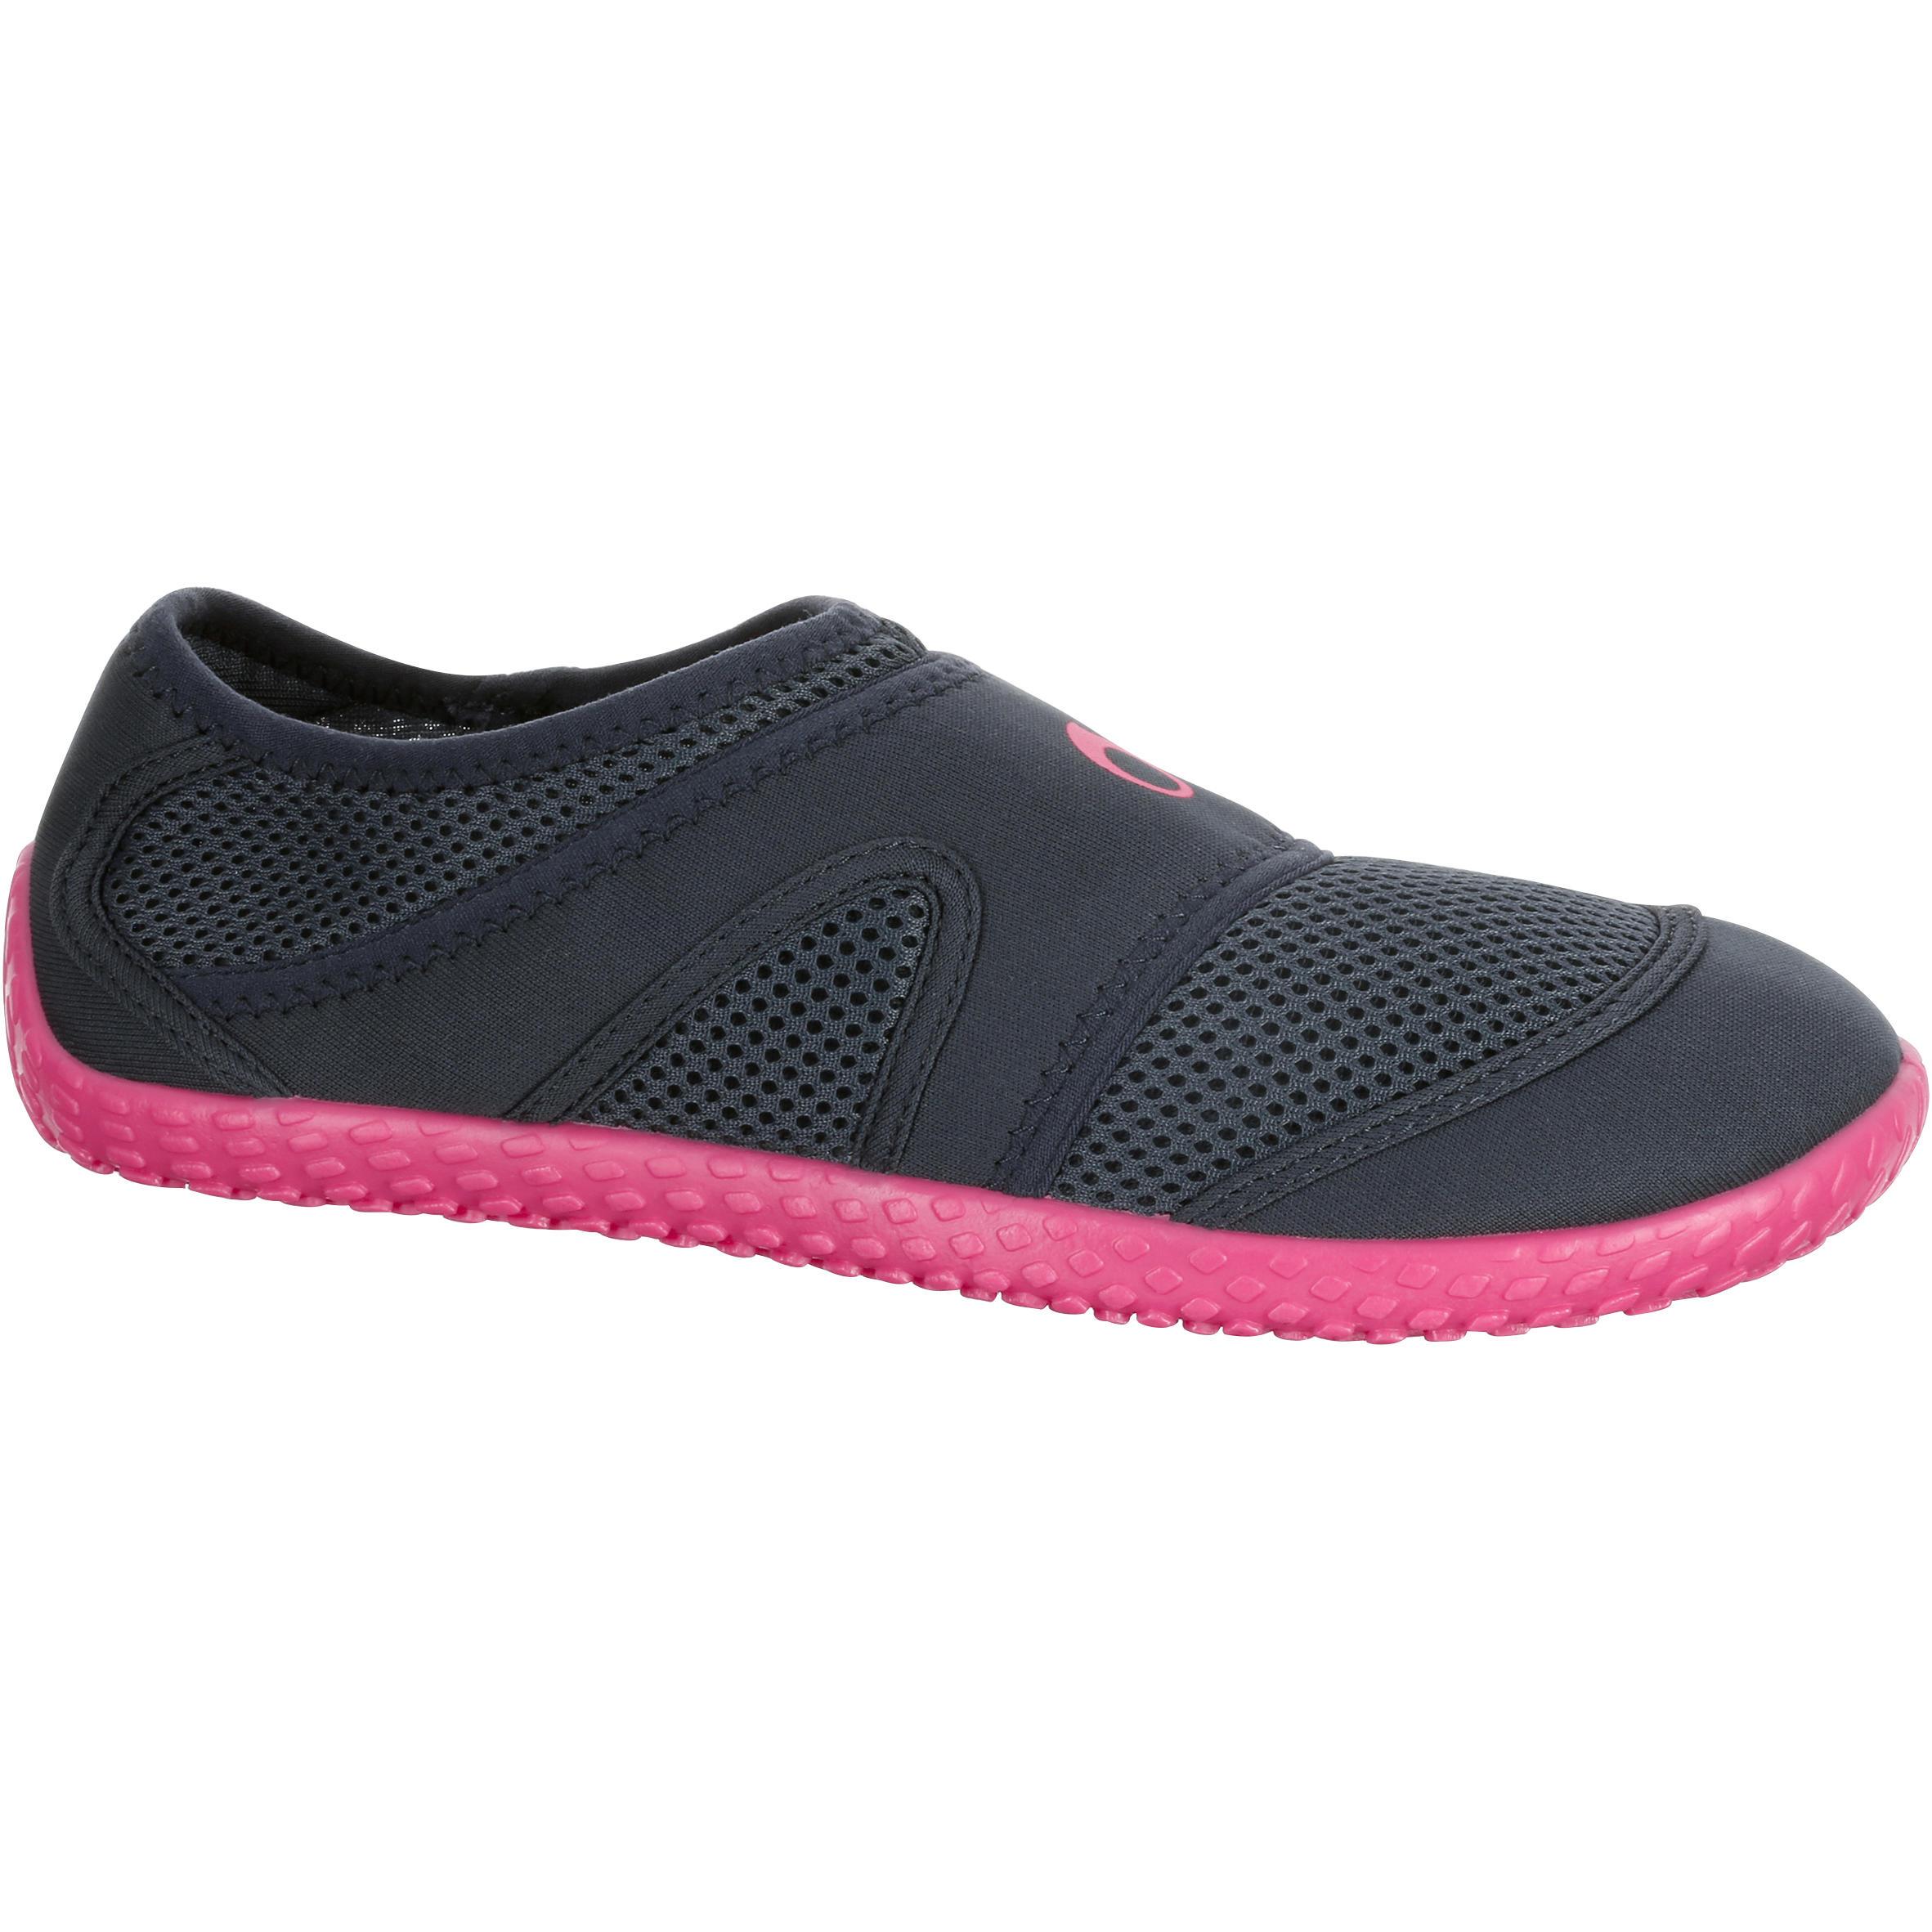 100 Sepatu Aquashoes - Abu Abu Pink